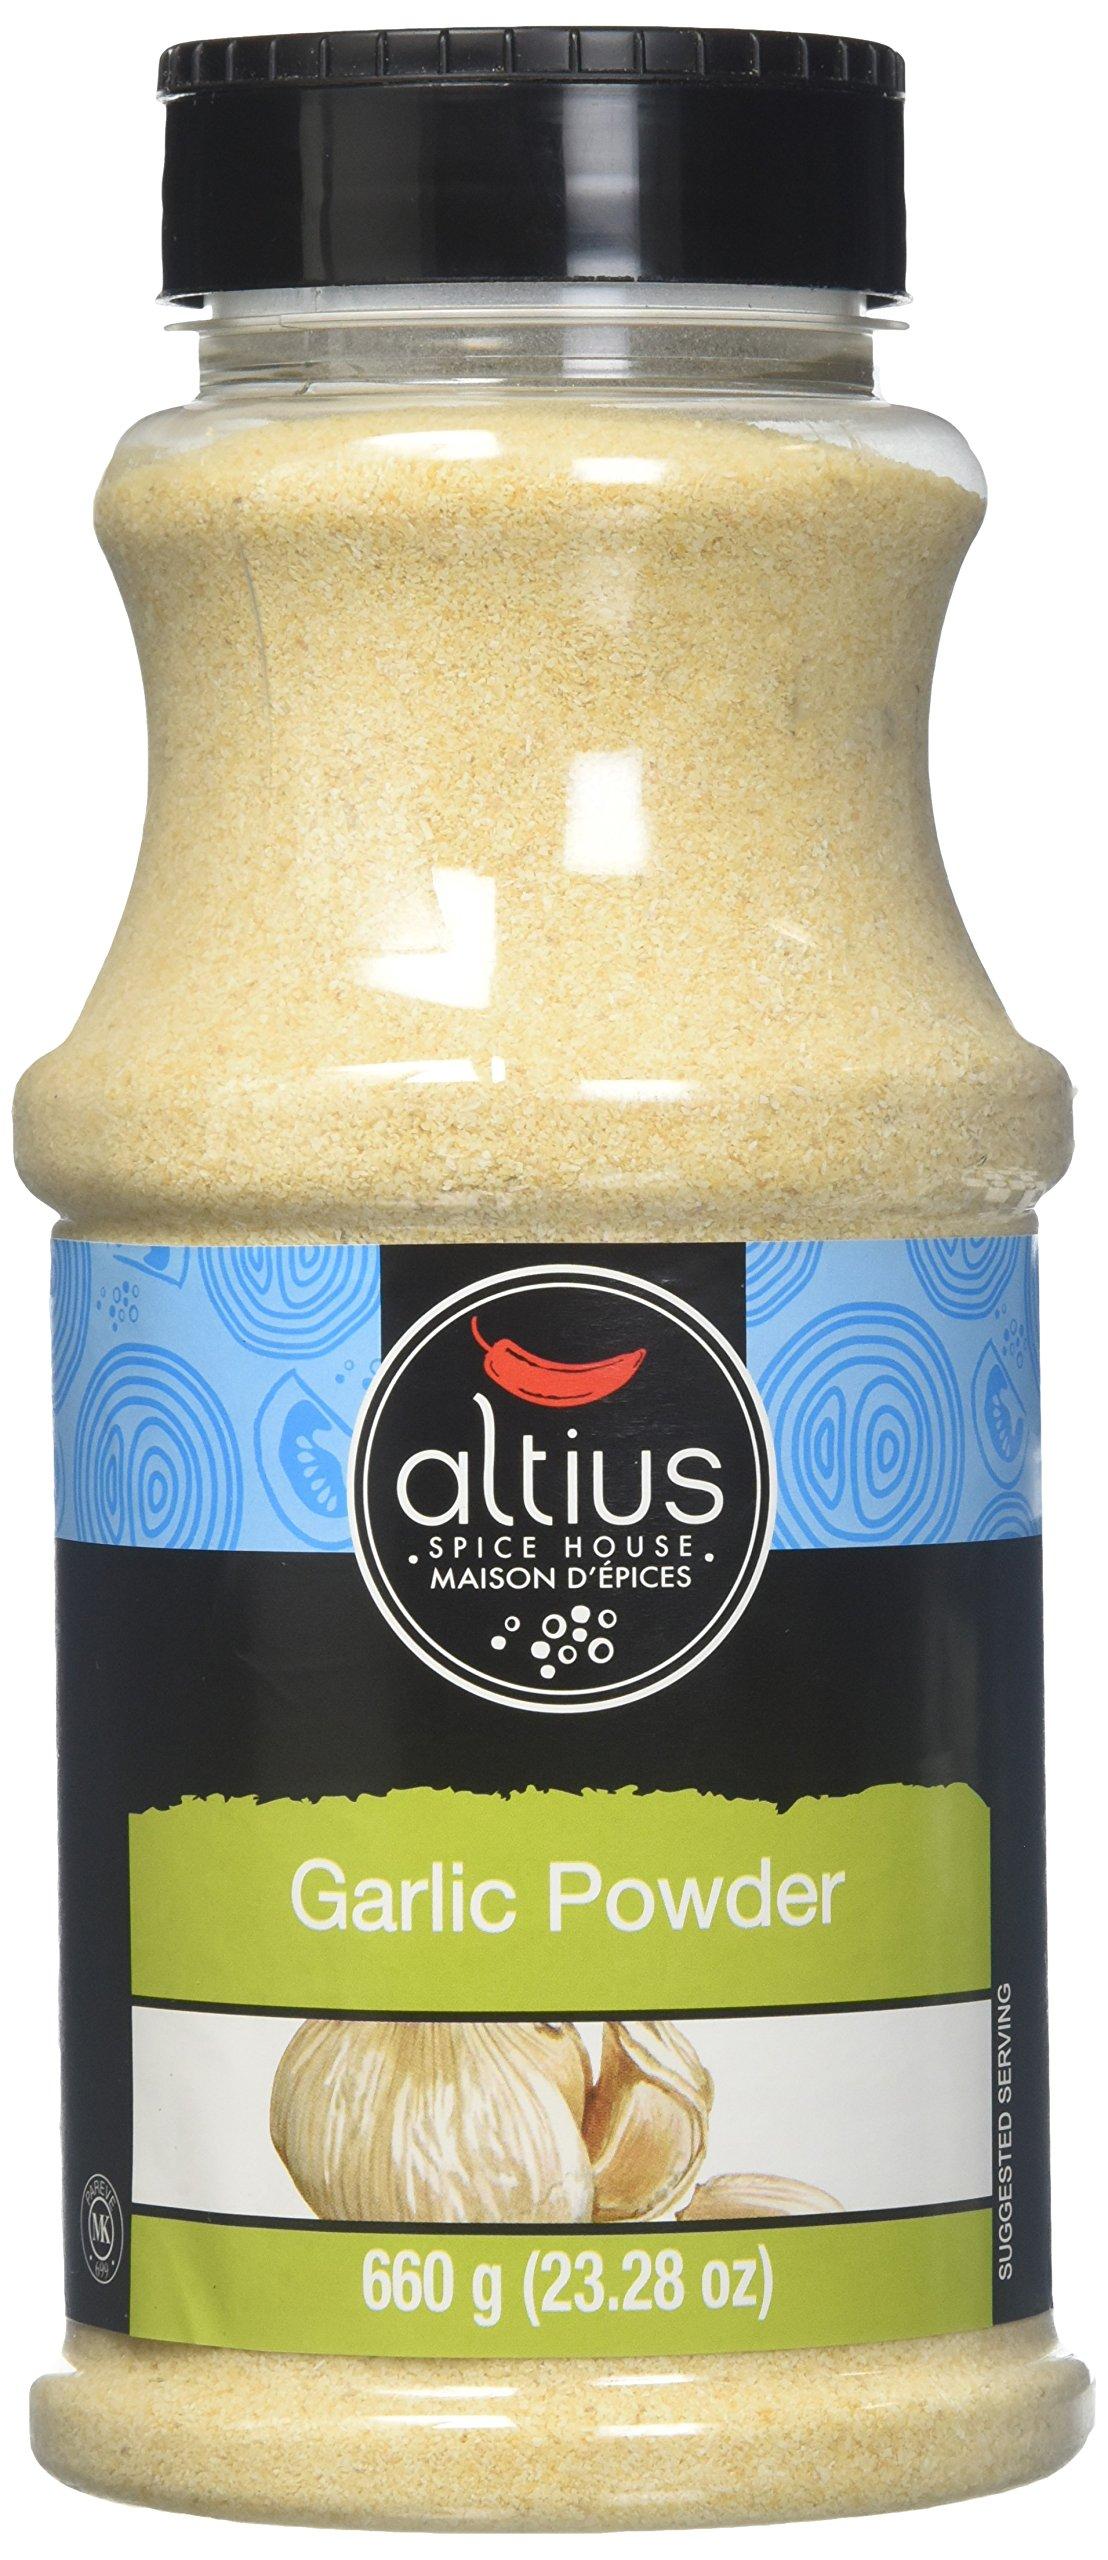 Altius Garlic Powder, Food Service Size Bottles, Used With Basil and Oregano, Kosher and Organic Certified, 23.28 oz